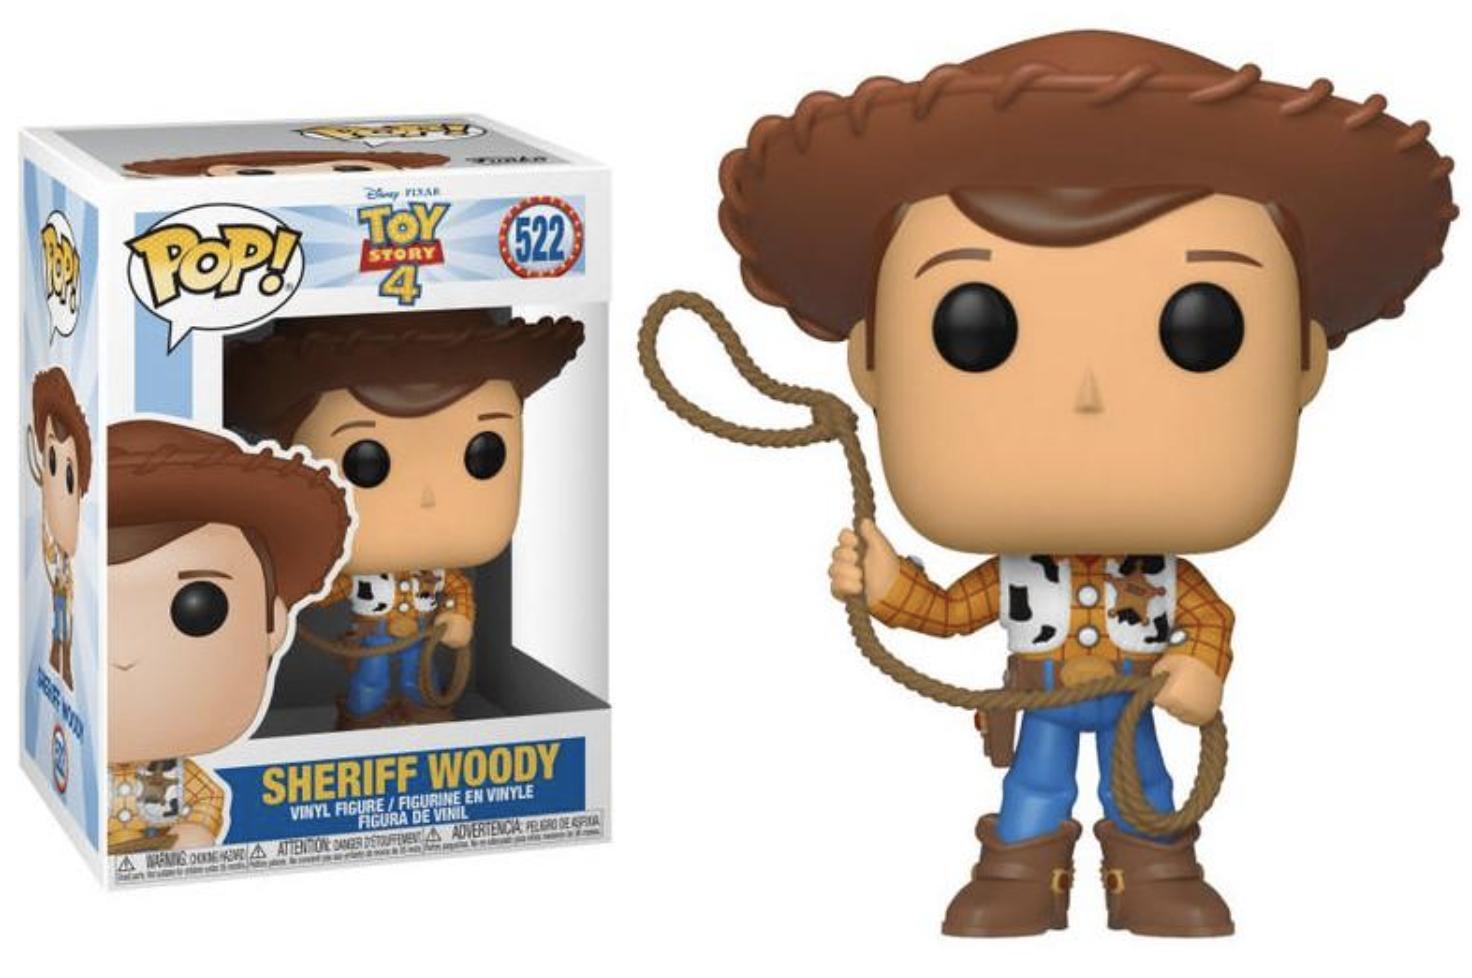 Toy Story 4 - Bobble Head Funko Pop N° 522 : Sheriff Woody